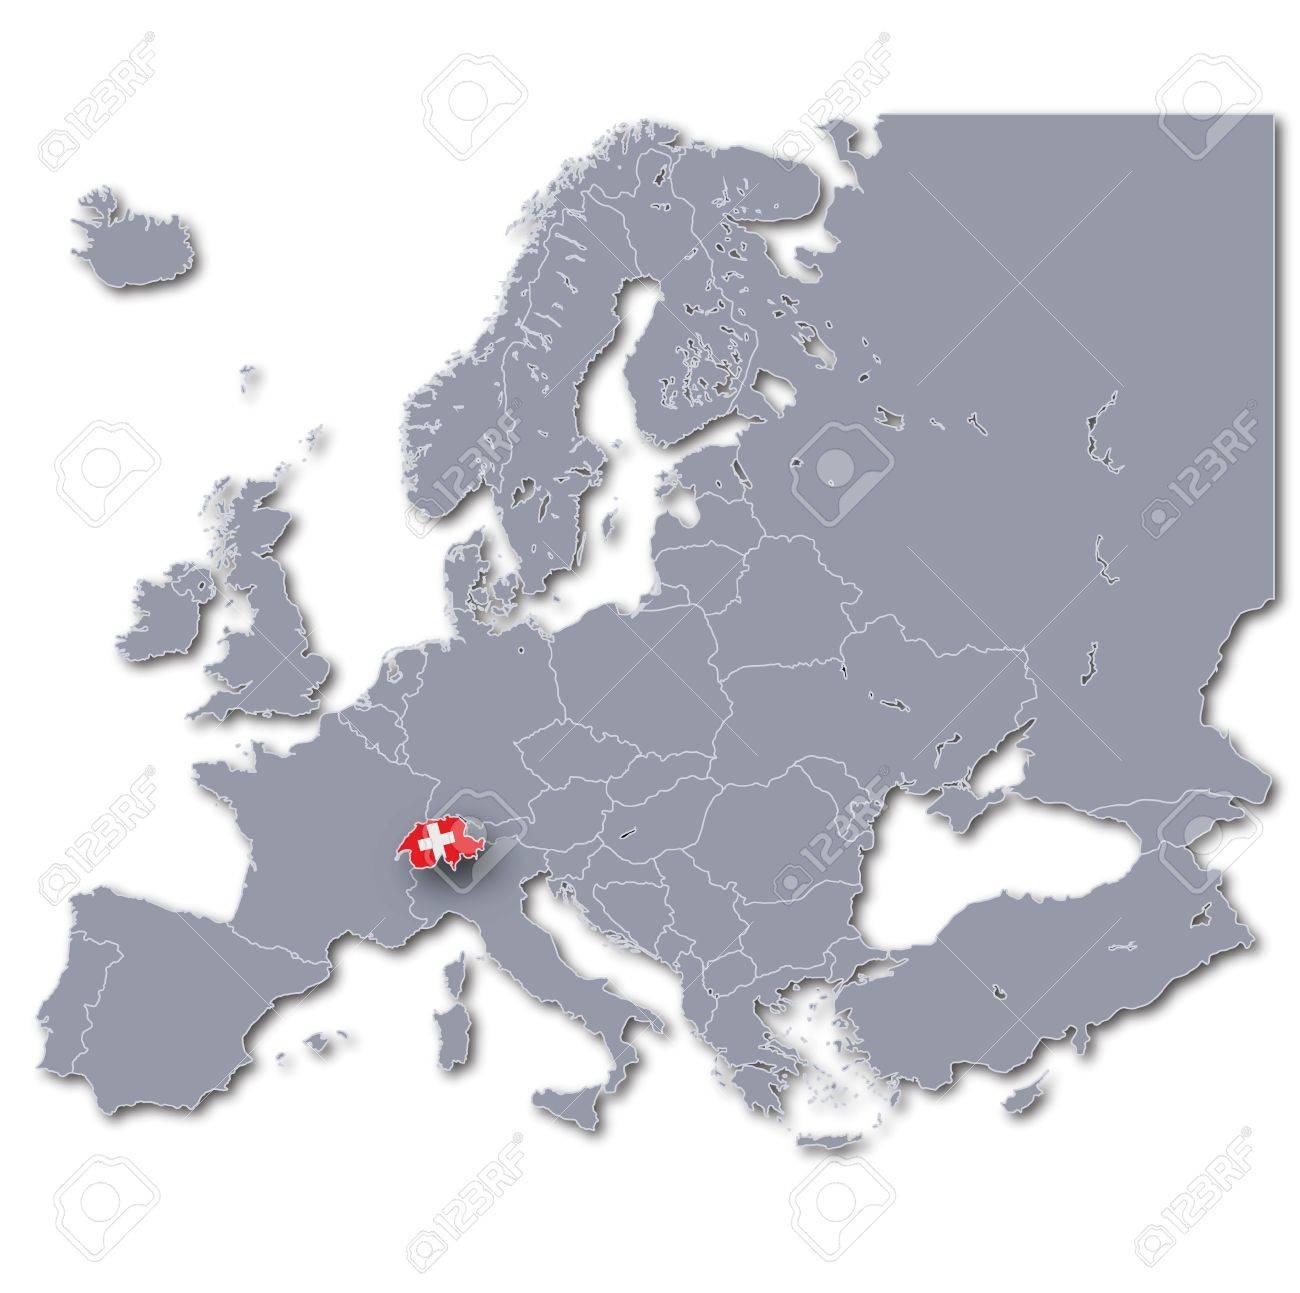 la suisse carte europe